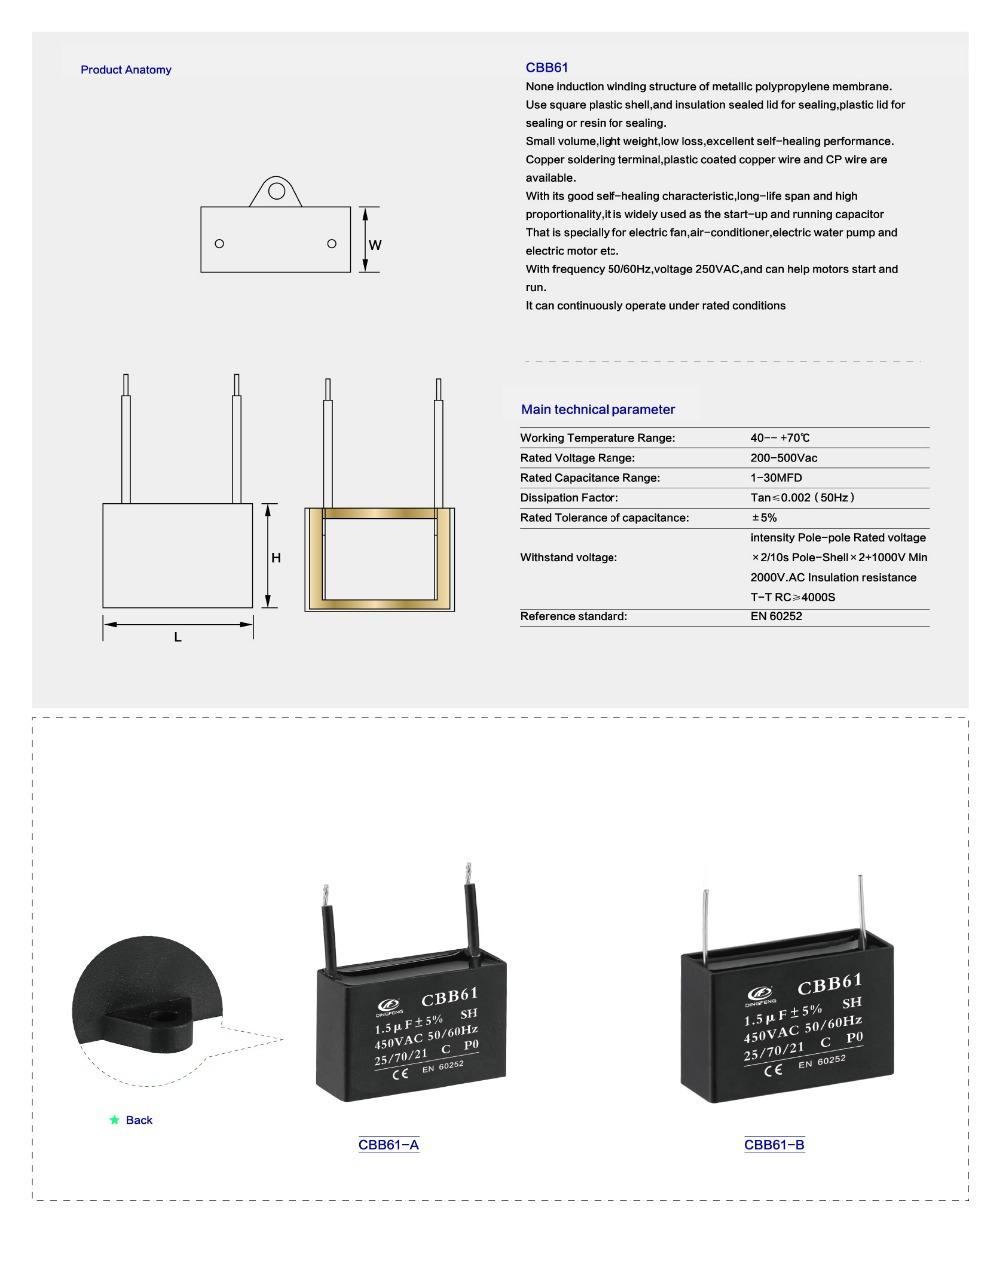 Ceiling Fan Wiring Diagram 450vac 15uf Cbb61 Capacitor Buy 1000v Motor Data 1